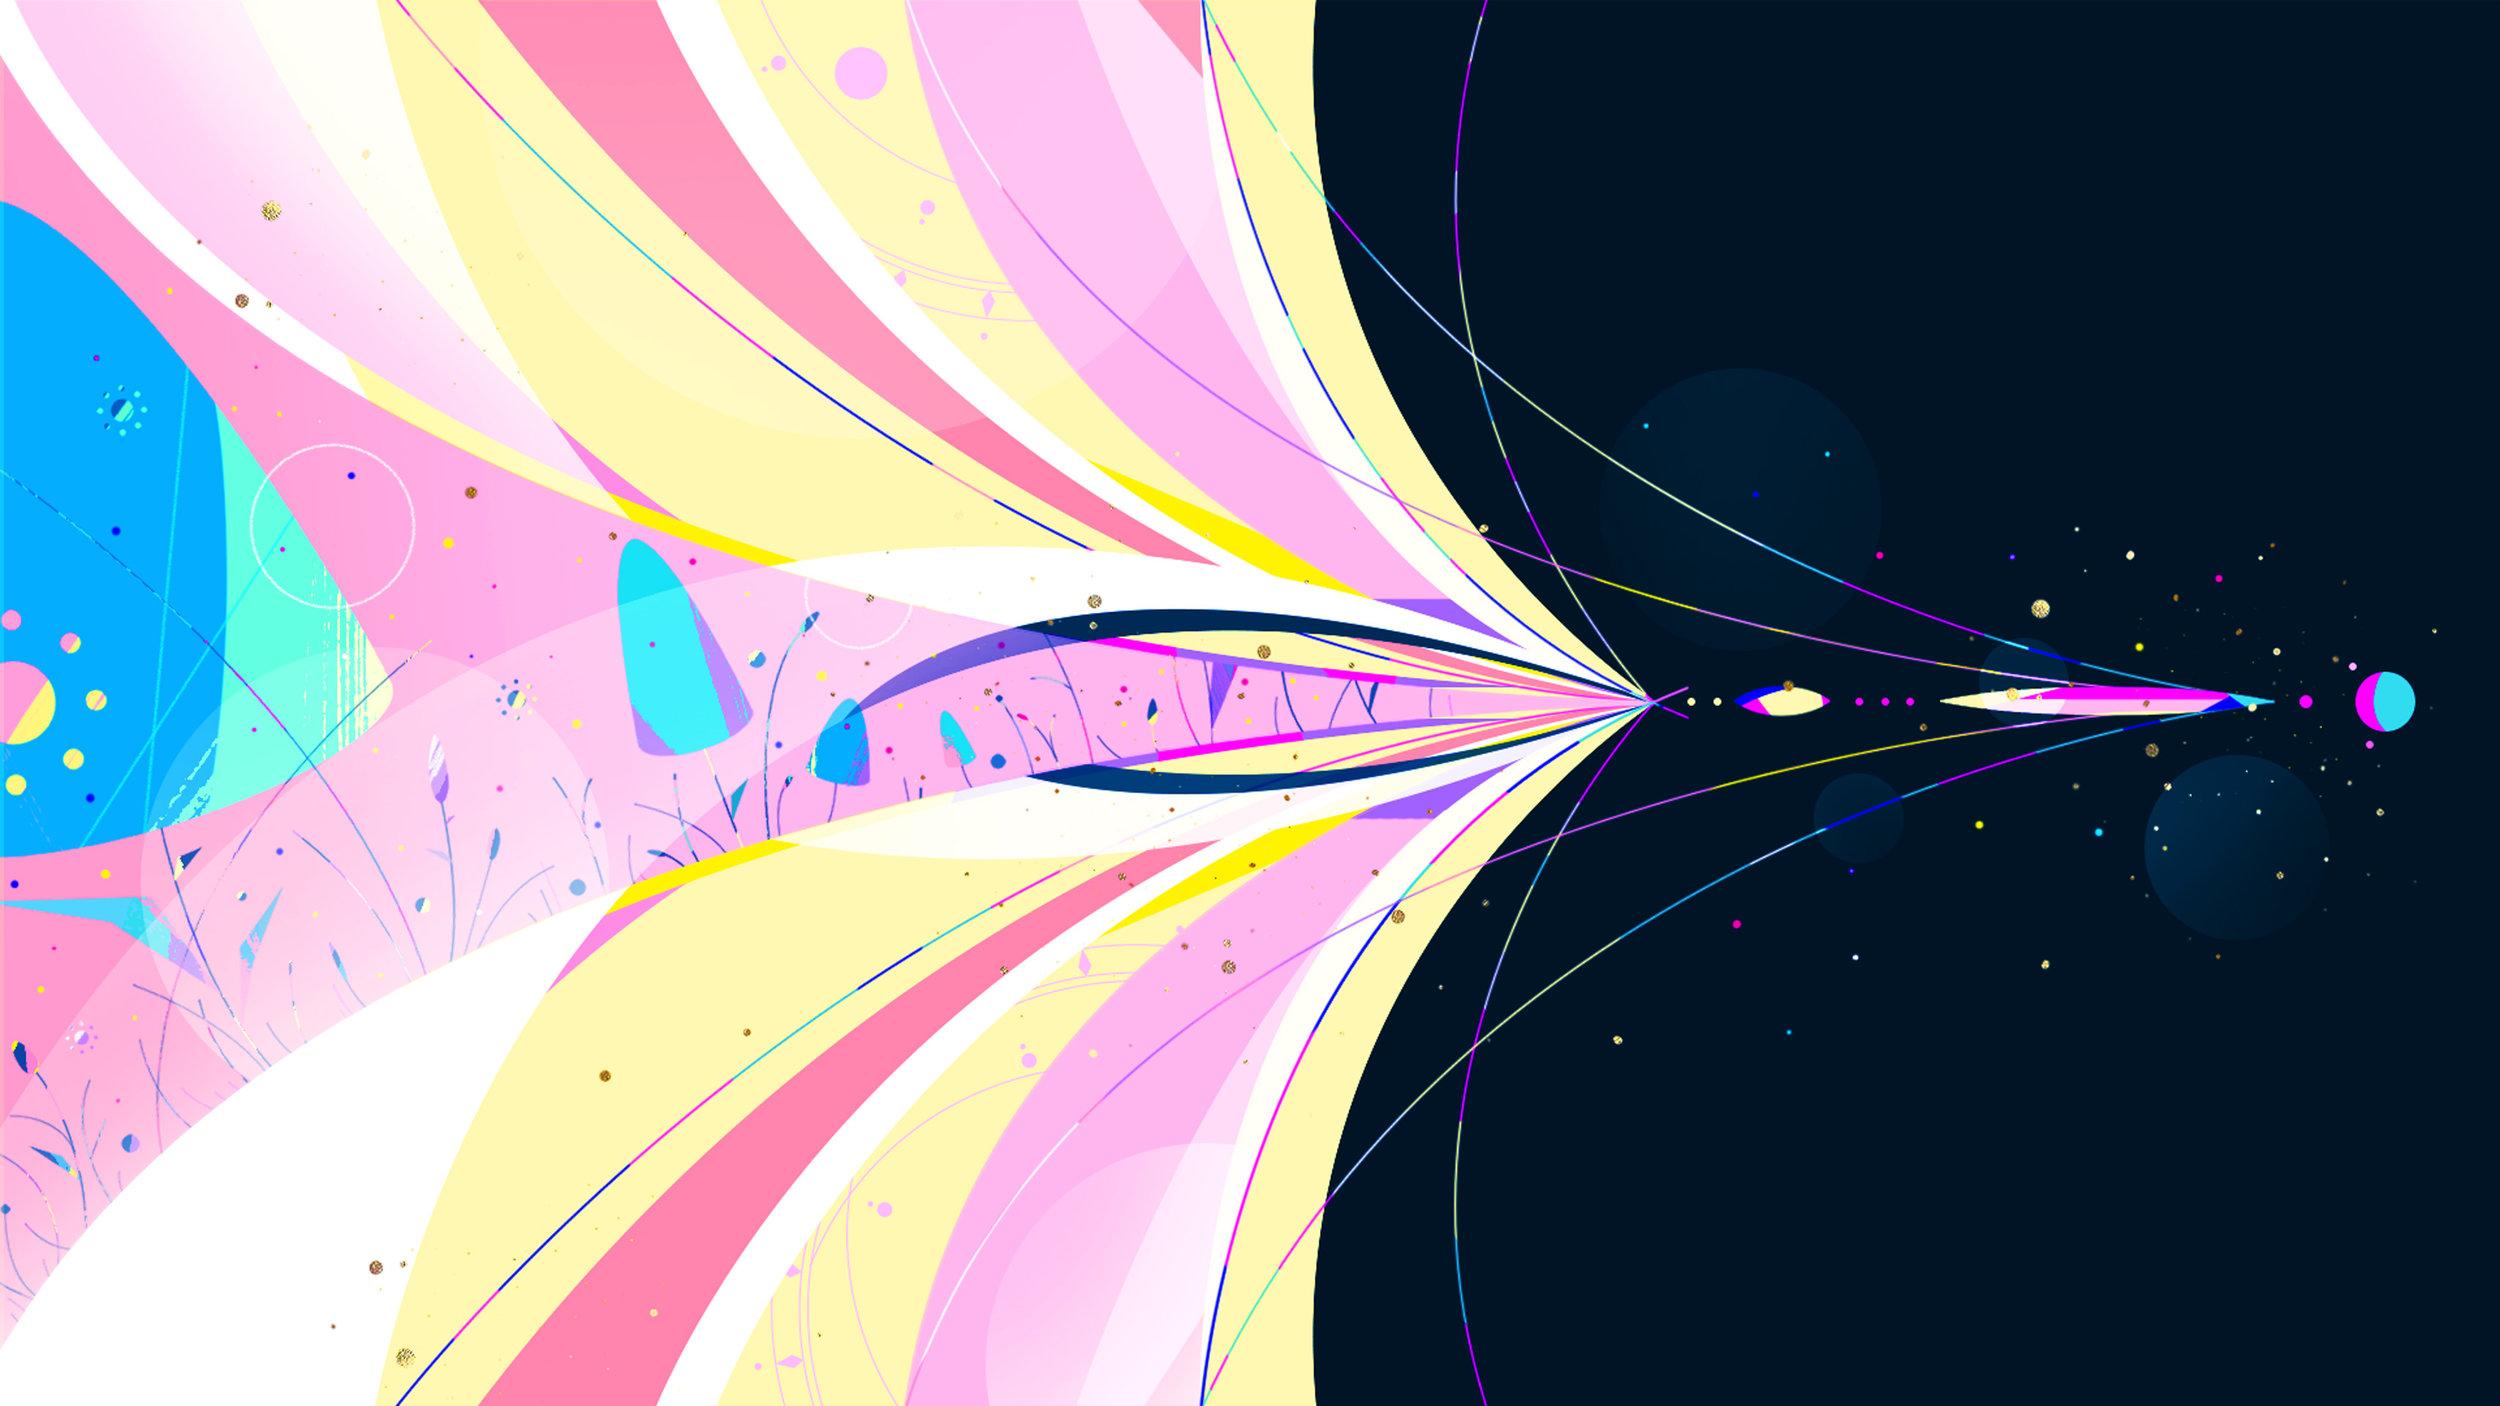 Dream_Animation_SofieLee_OmidSeraj_015.jpg